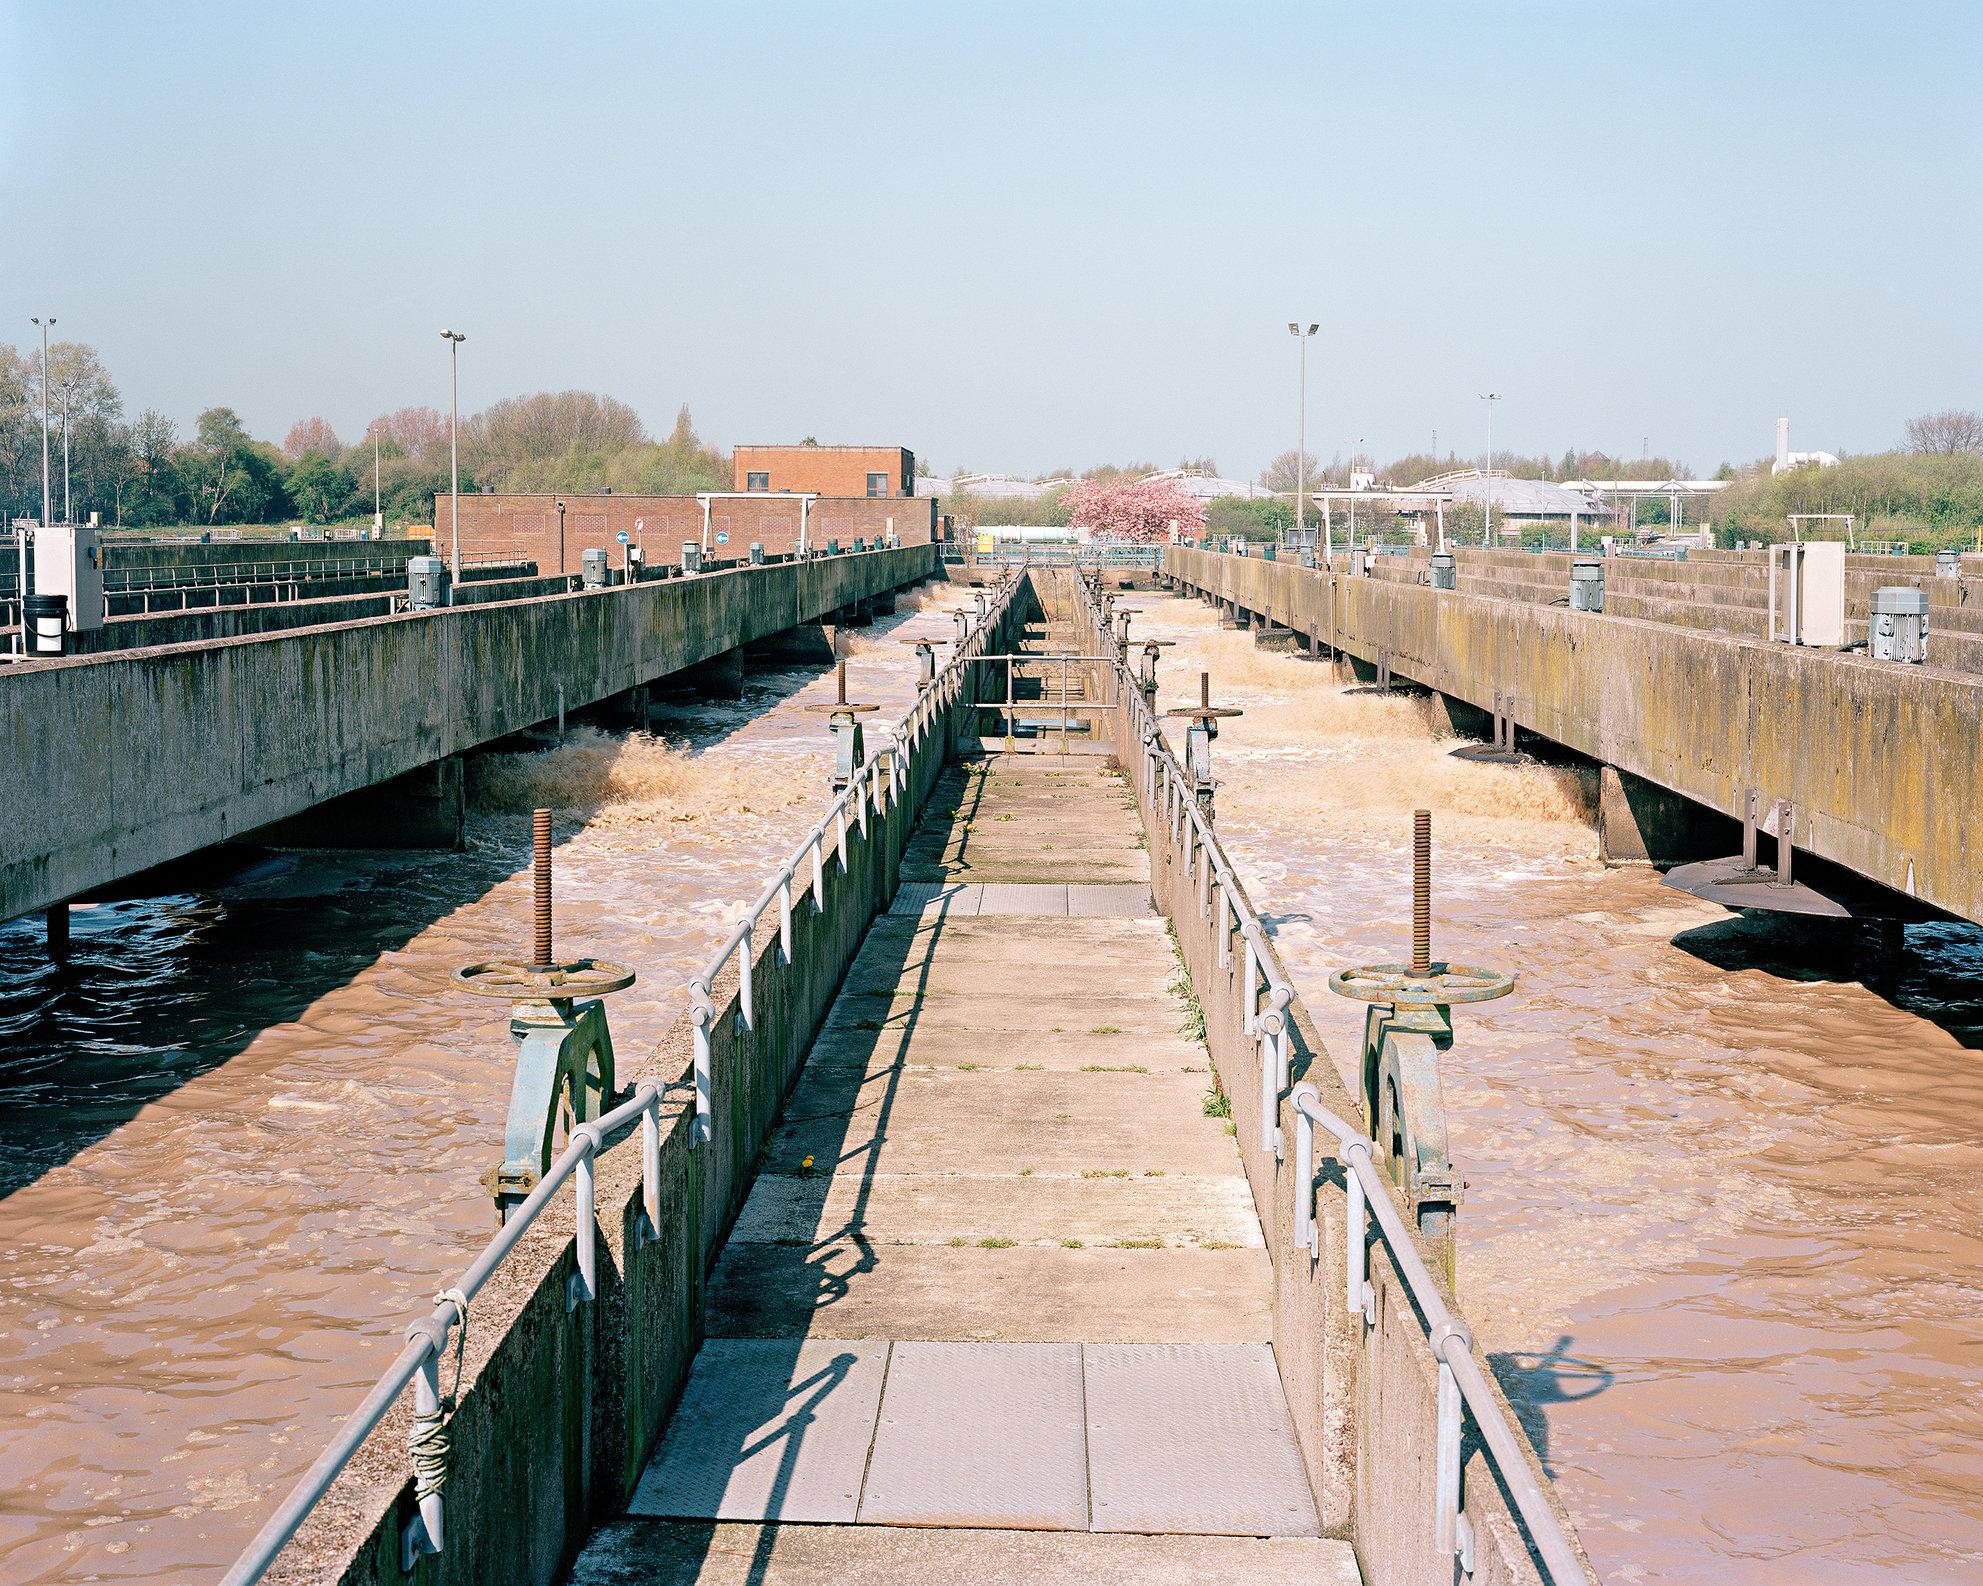 Activated Sludge Plant, Davyhulme Sewage Treatment Works, Trafford